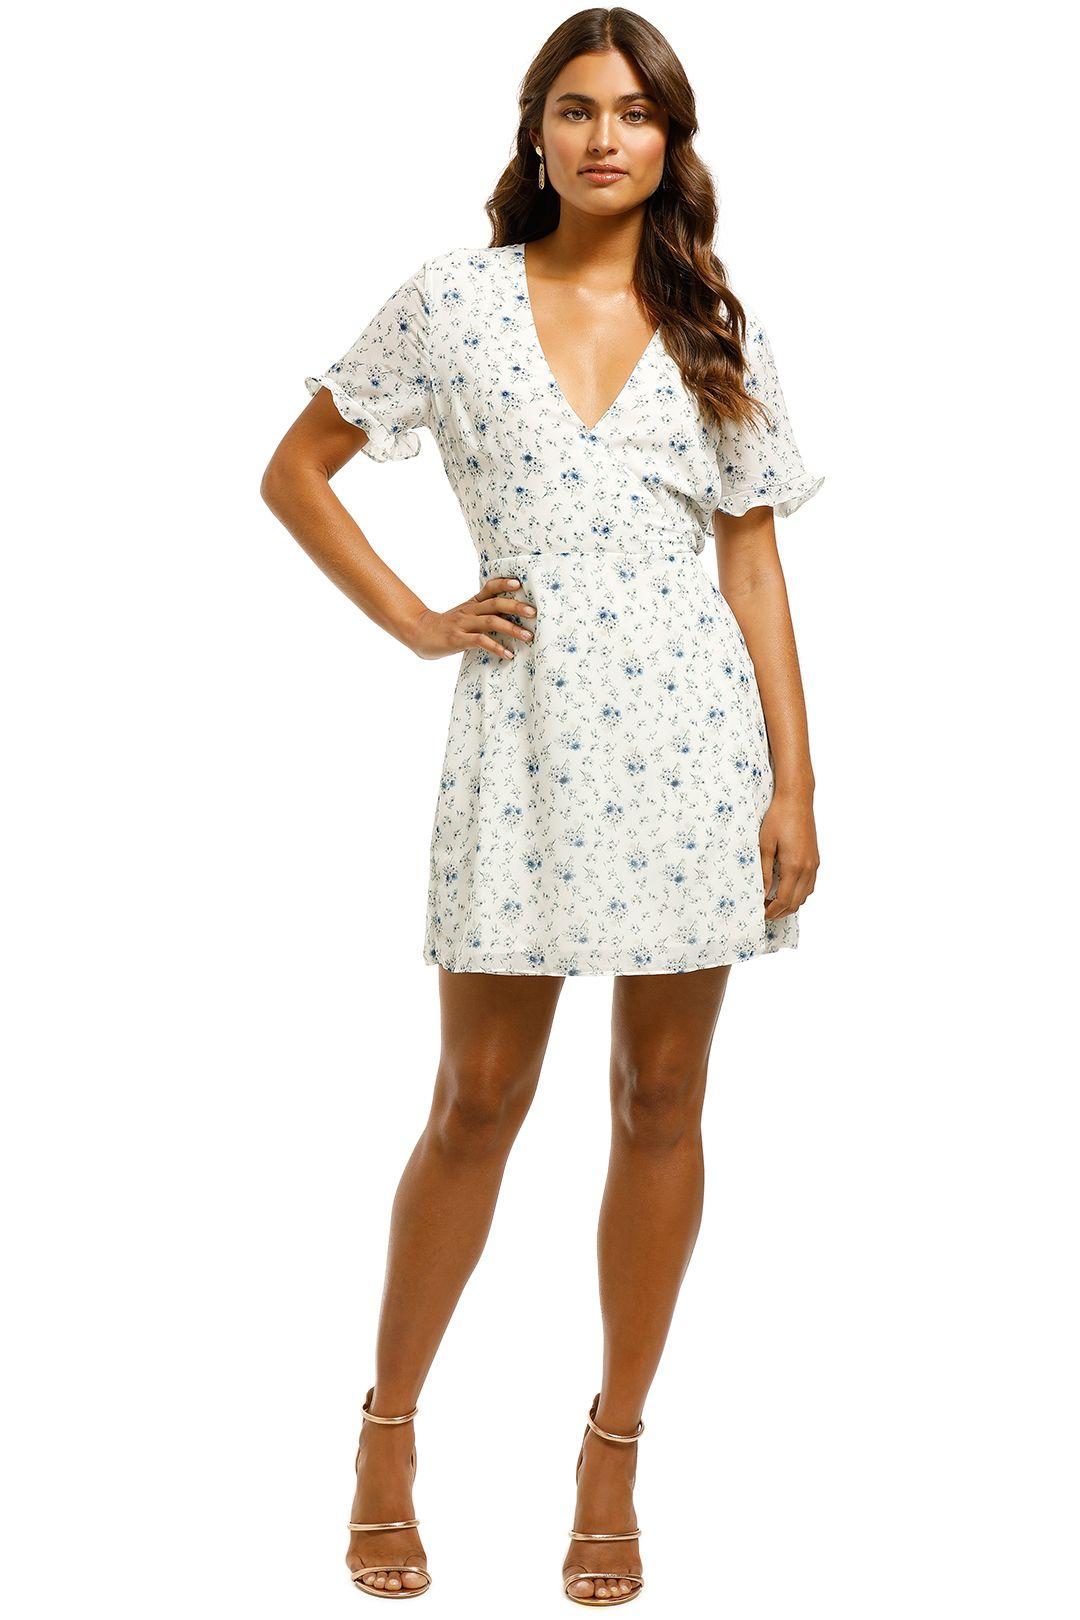 The-East-Order-Lucia-Mini-Dress-Romantic-Garden-Front